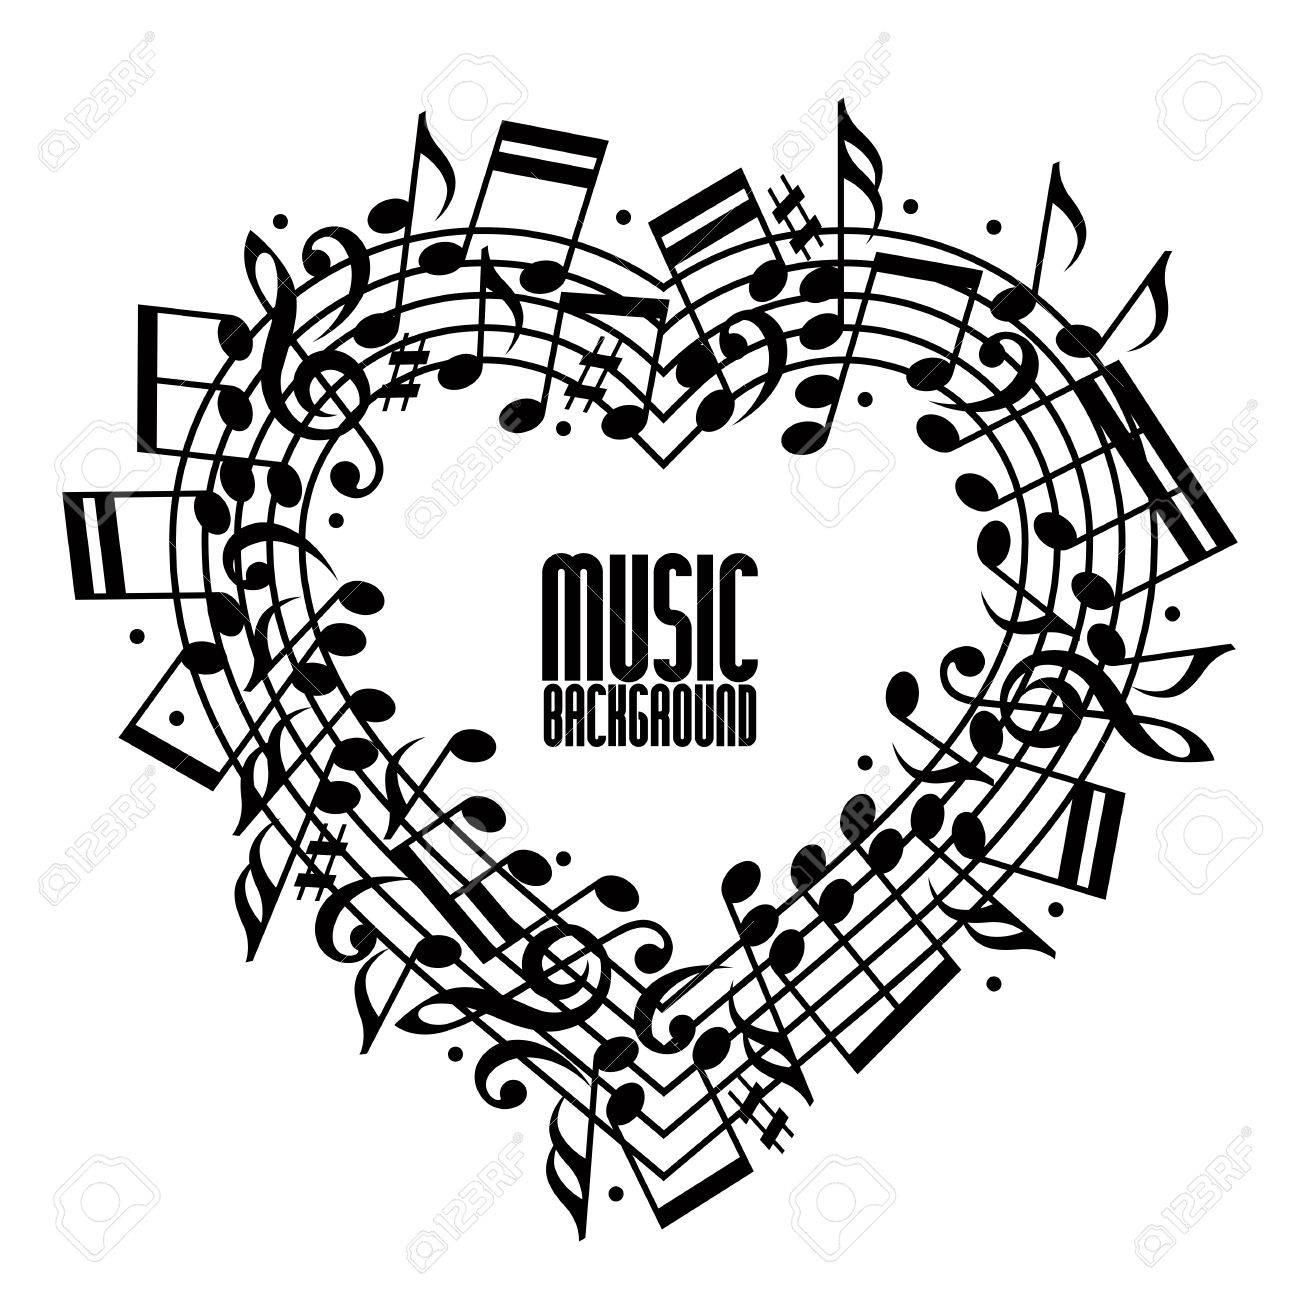 Vector Negro Redondeado A Evitar Con Las Notas Musicales Sobre Fondo